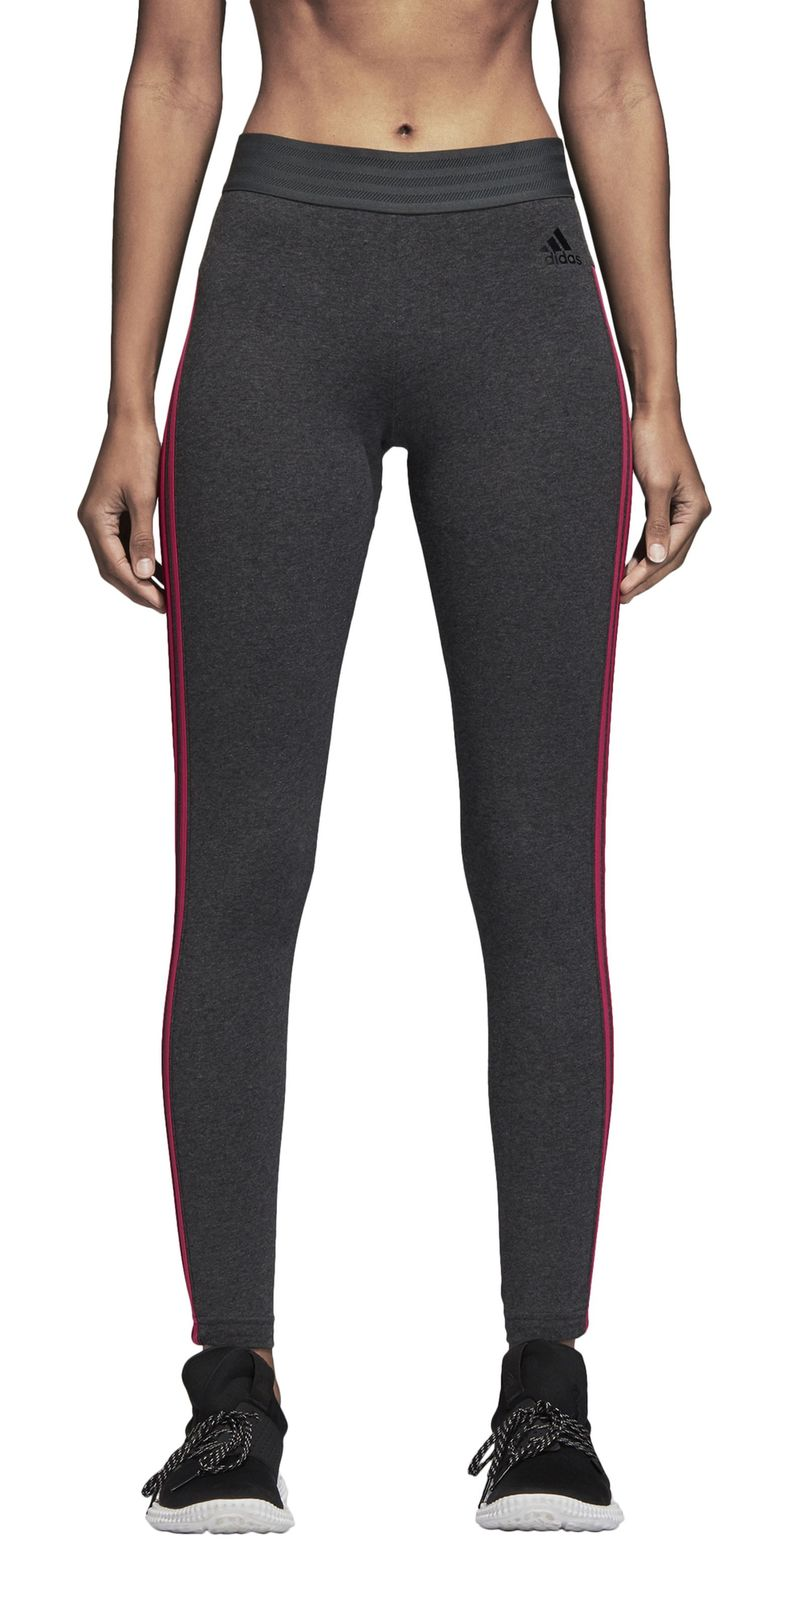 275d03c8a232cd Core Damen Adidas Tight Grau Hose Fitness Sport 3 Stripes Essentials 675d51n